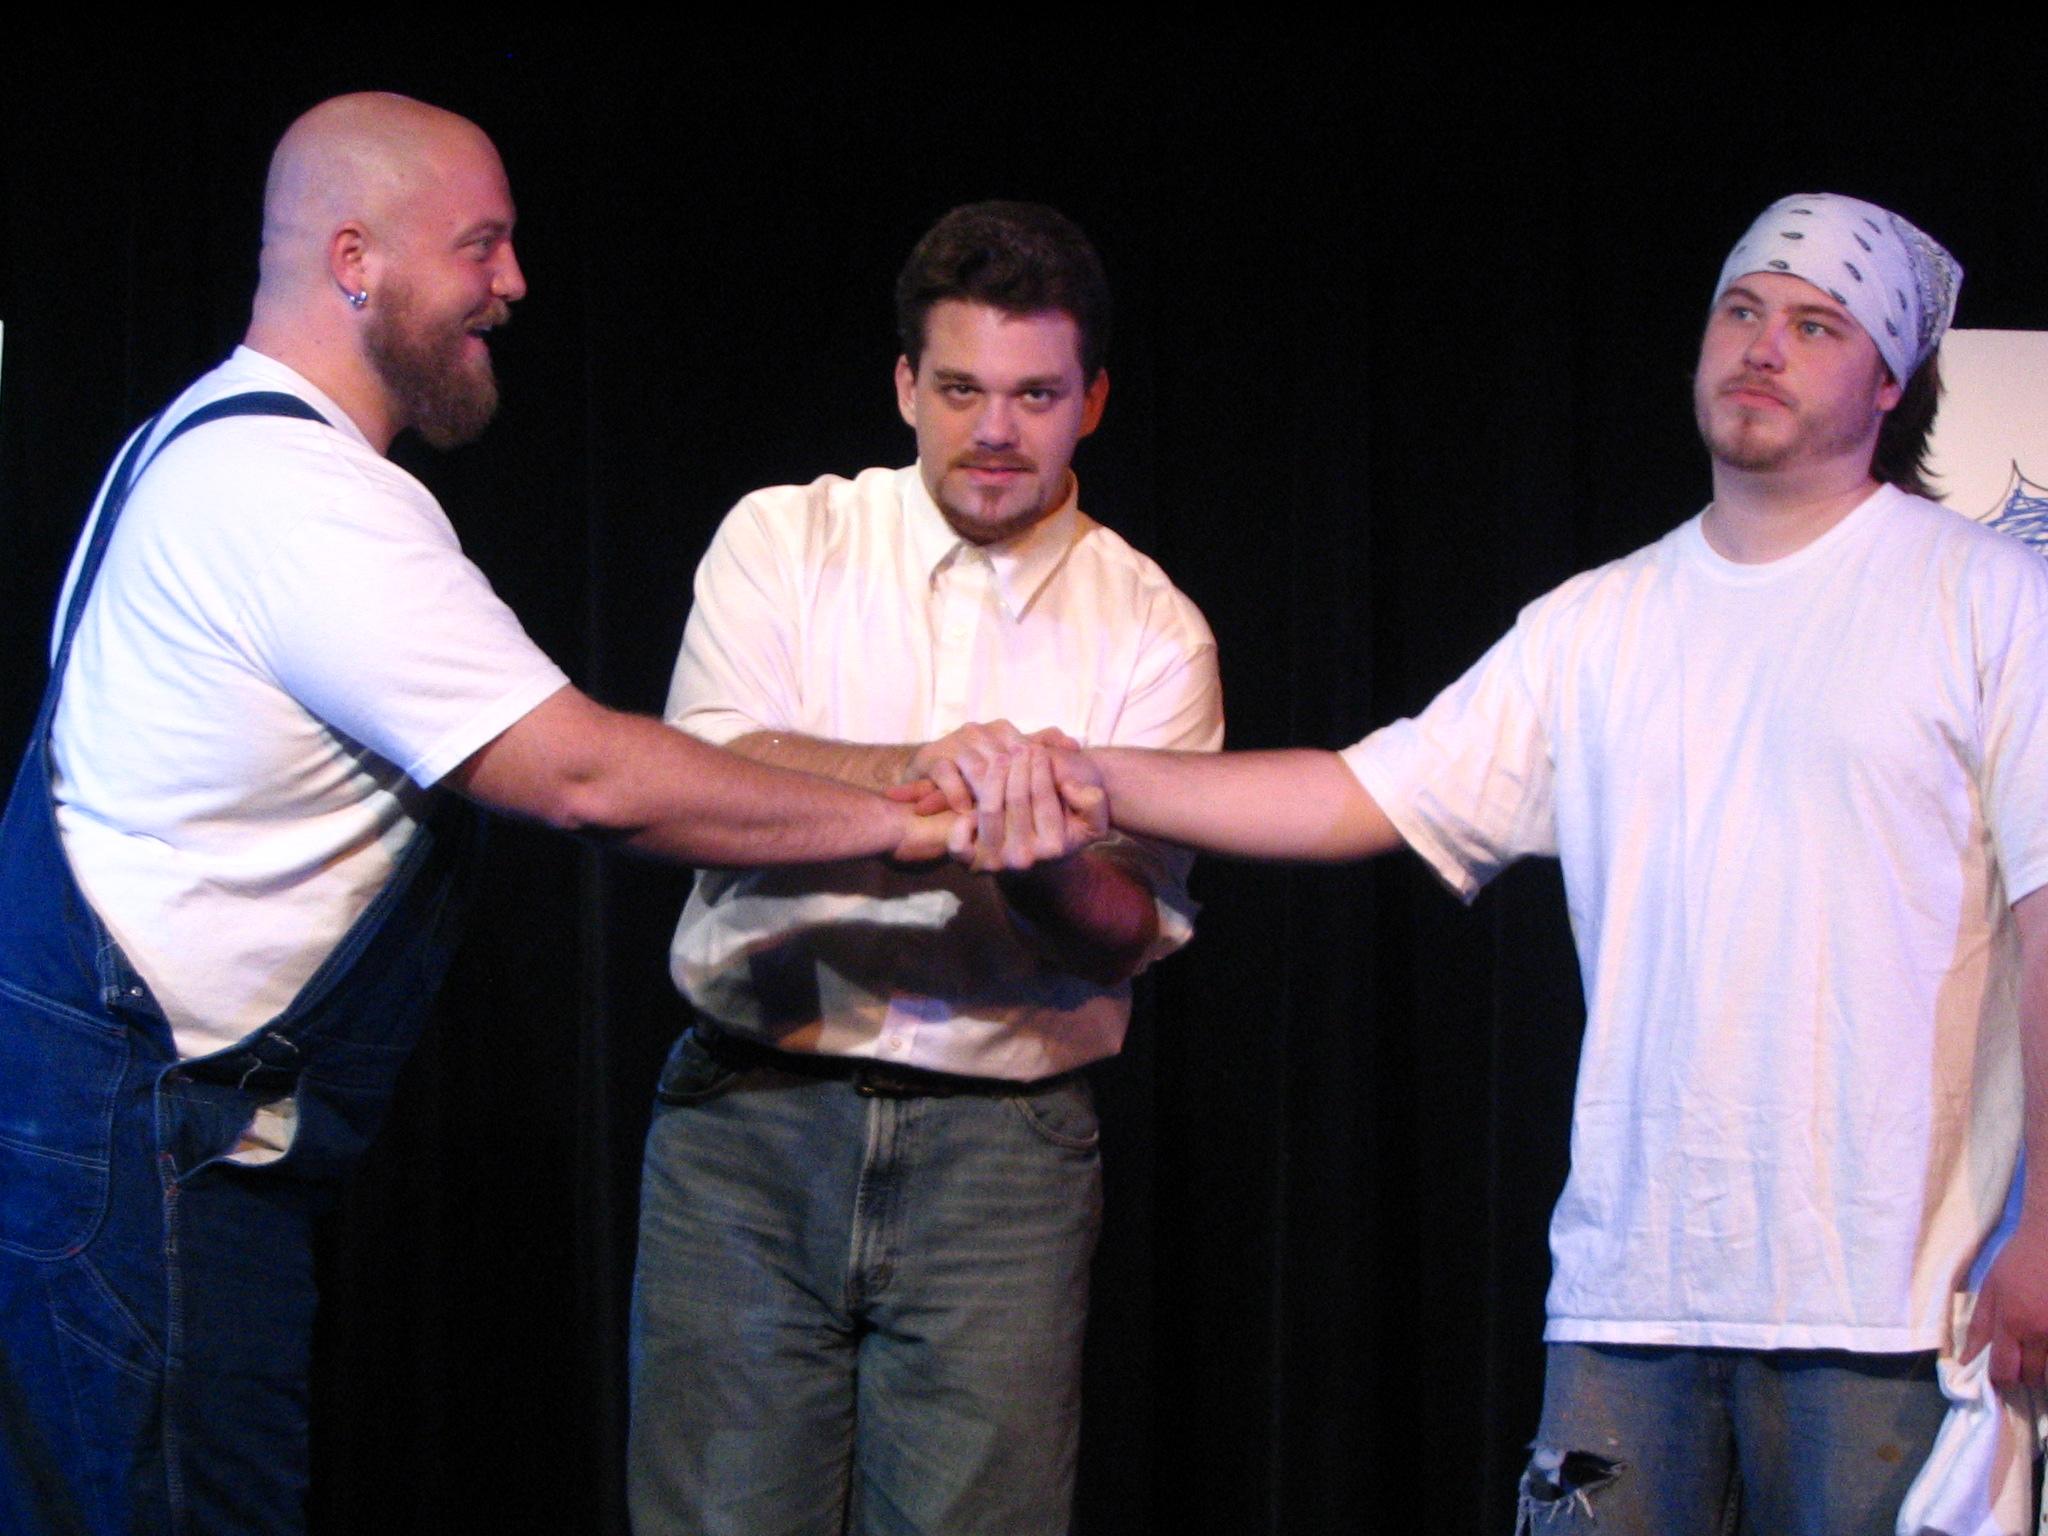 Jason Vogen, Aaron Konigsmark and Josh Vogen